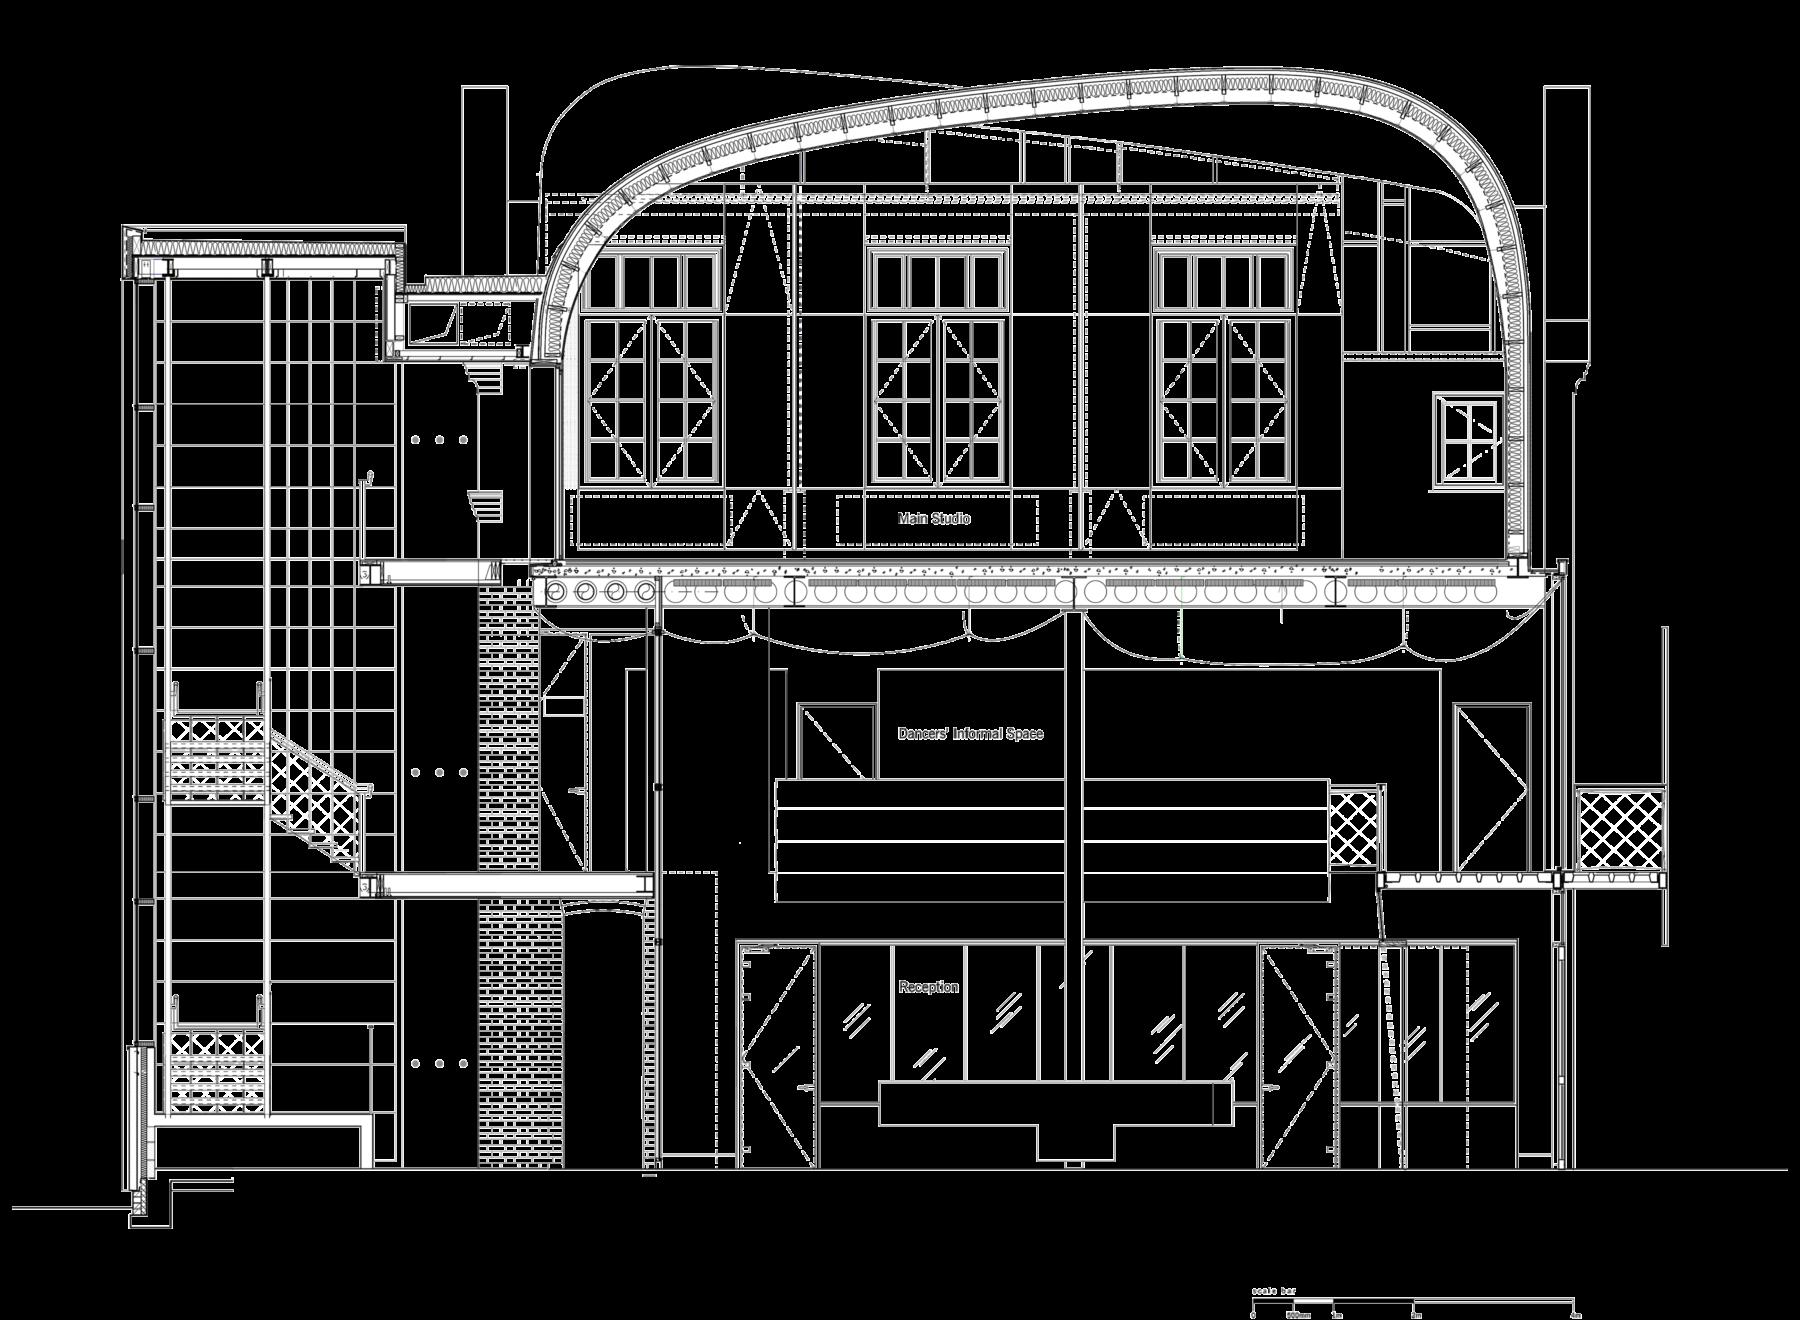 Sarah-Wigglesworth-Architects Siobhan-Davies-Dance Section H 3600